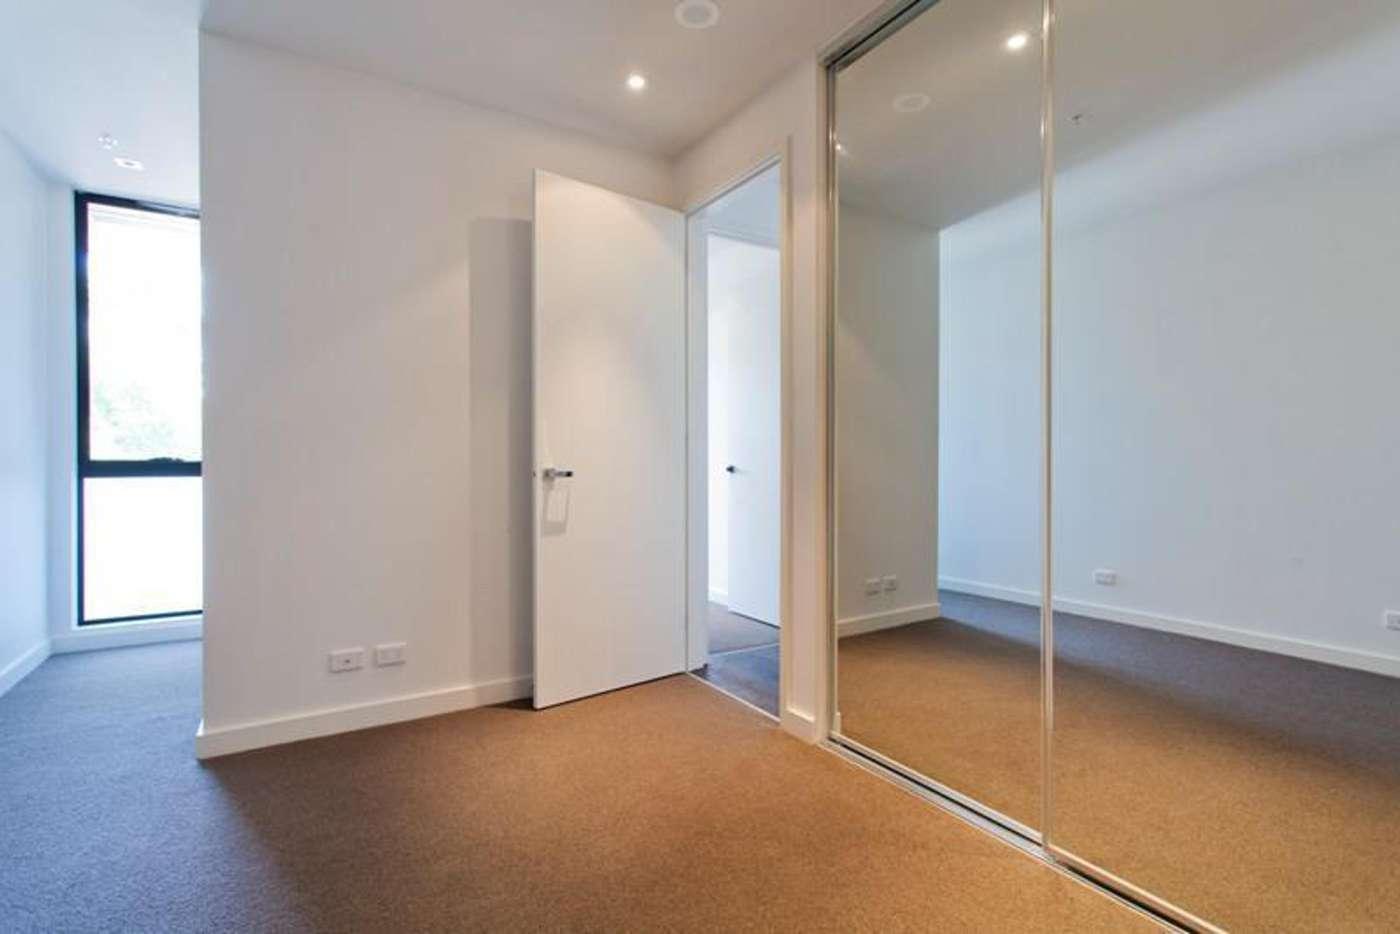 Sixth view of Homely apartment listing, 107/108 Glen Iris Road, Glen Iris VIC 3146